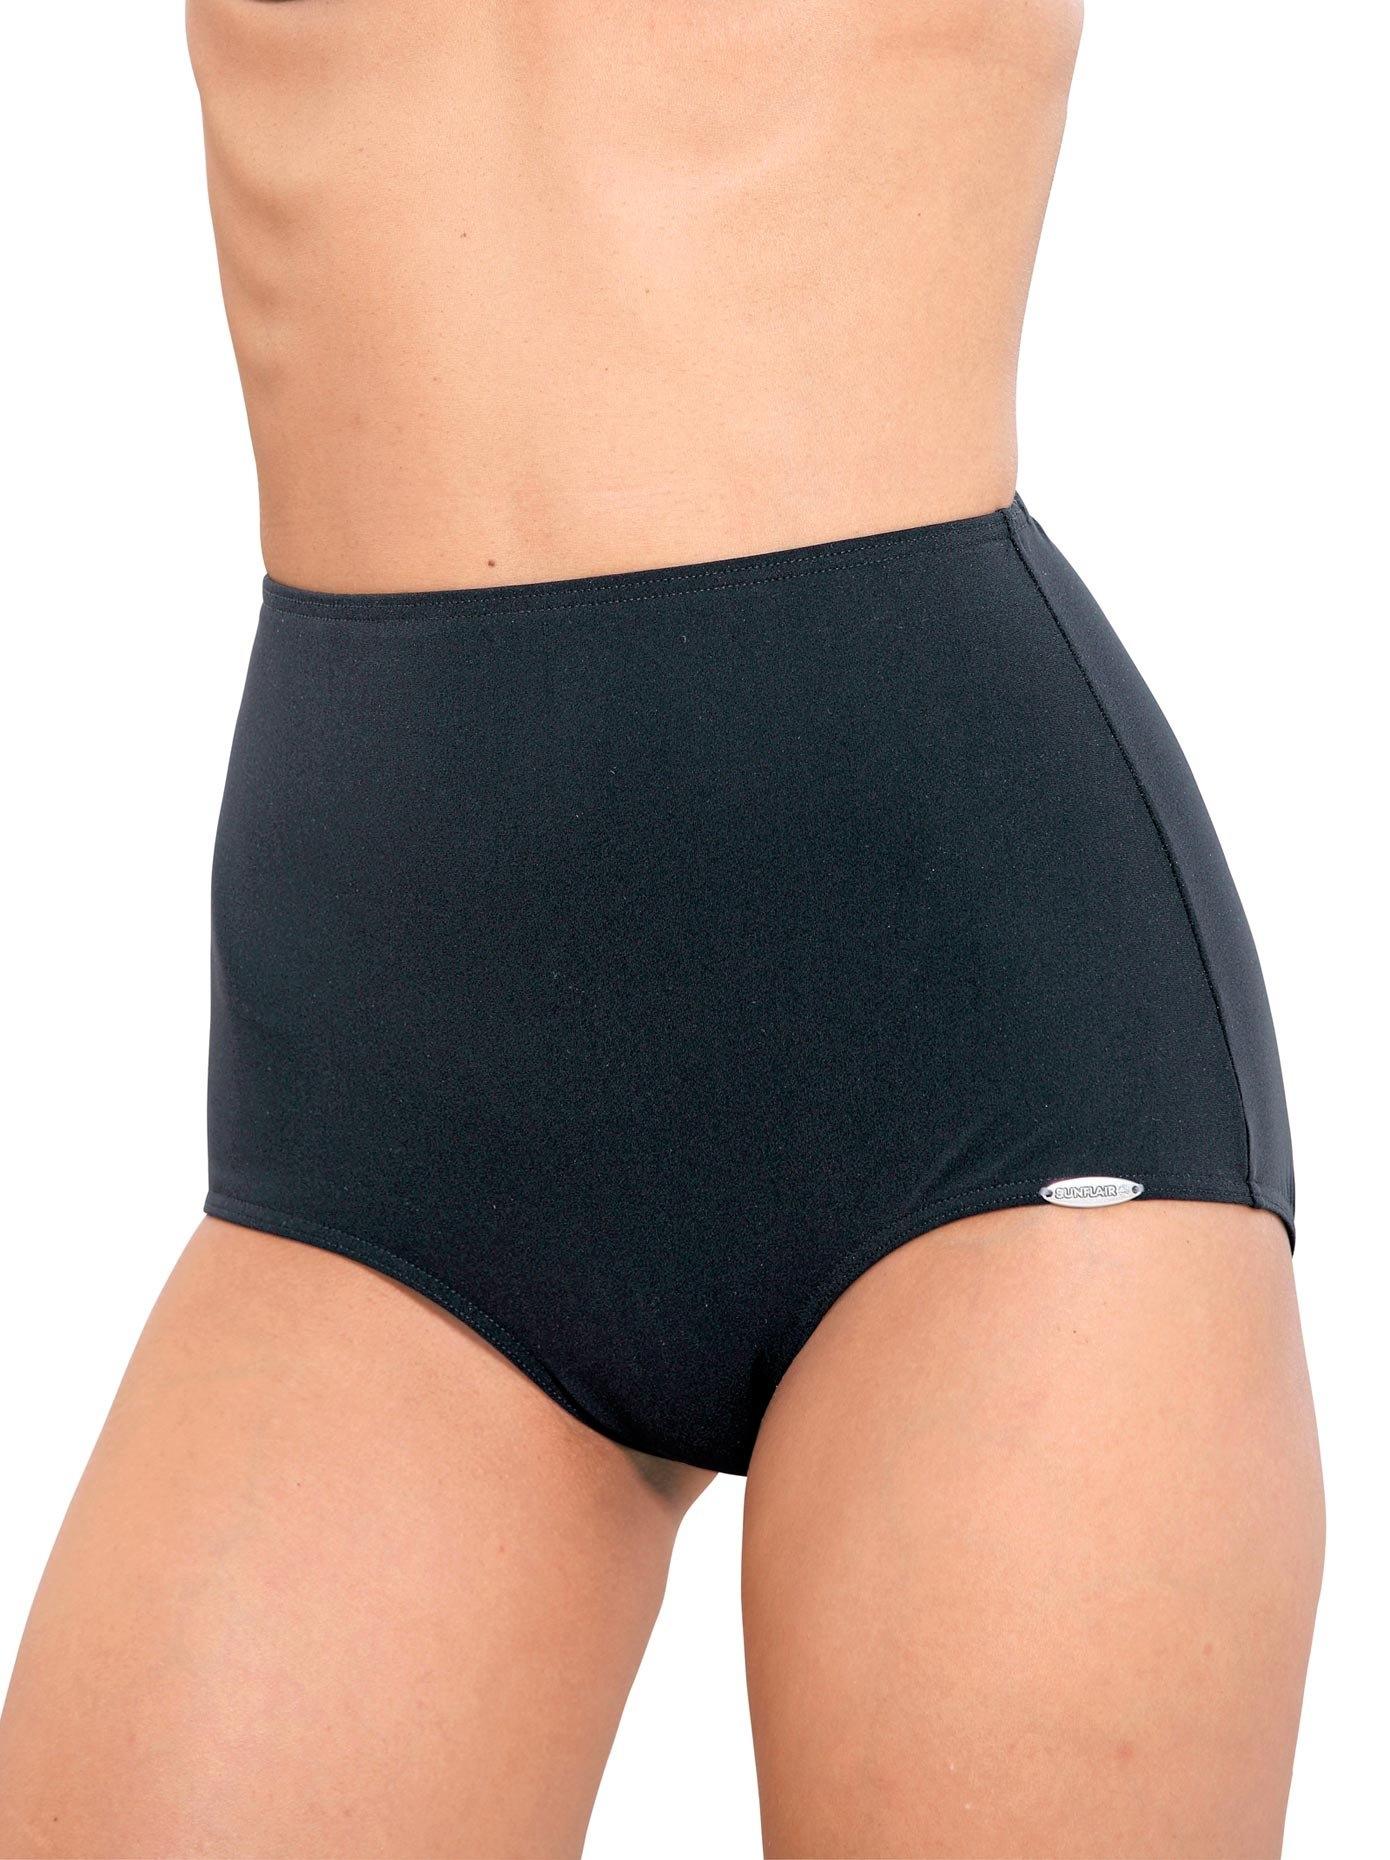 Sunflair Bikinibroekje online kopen op otto.nl